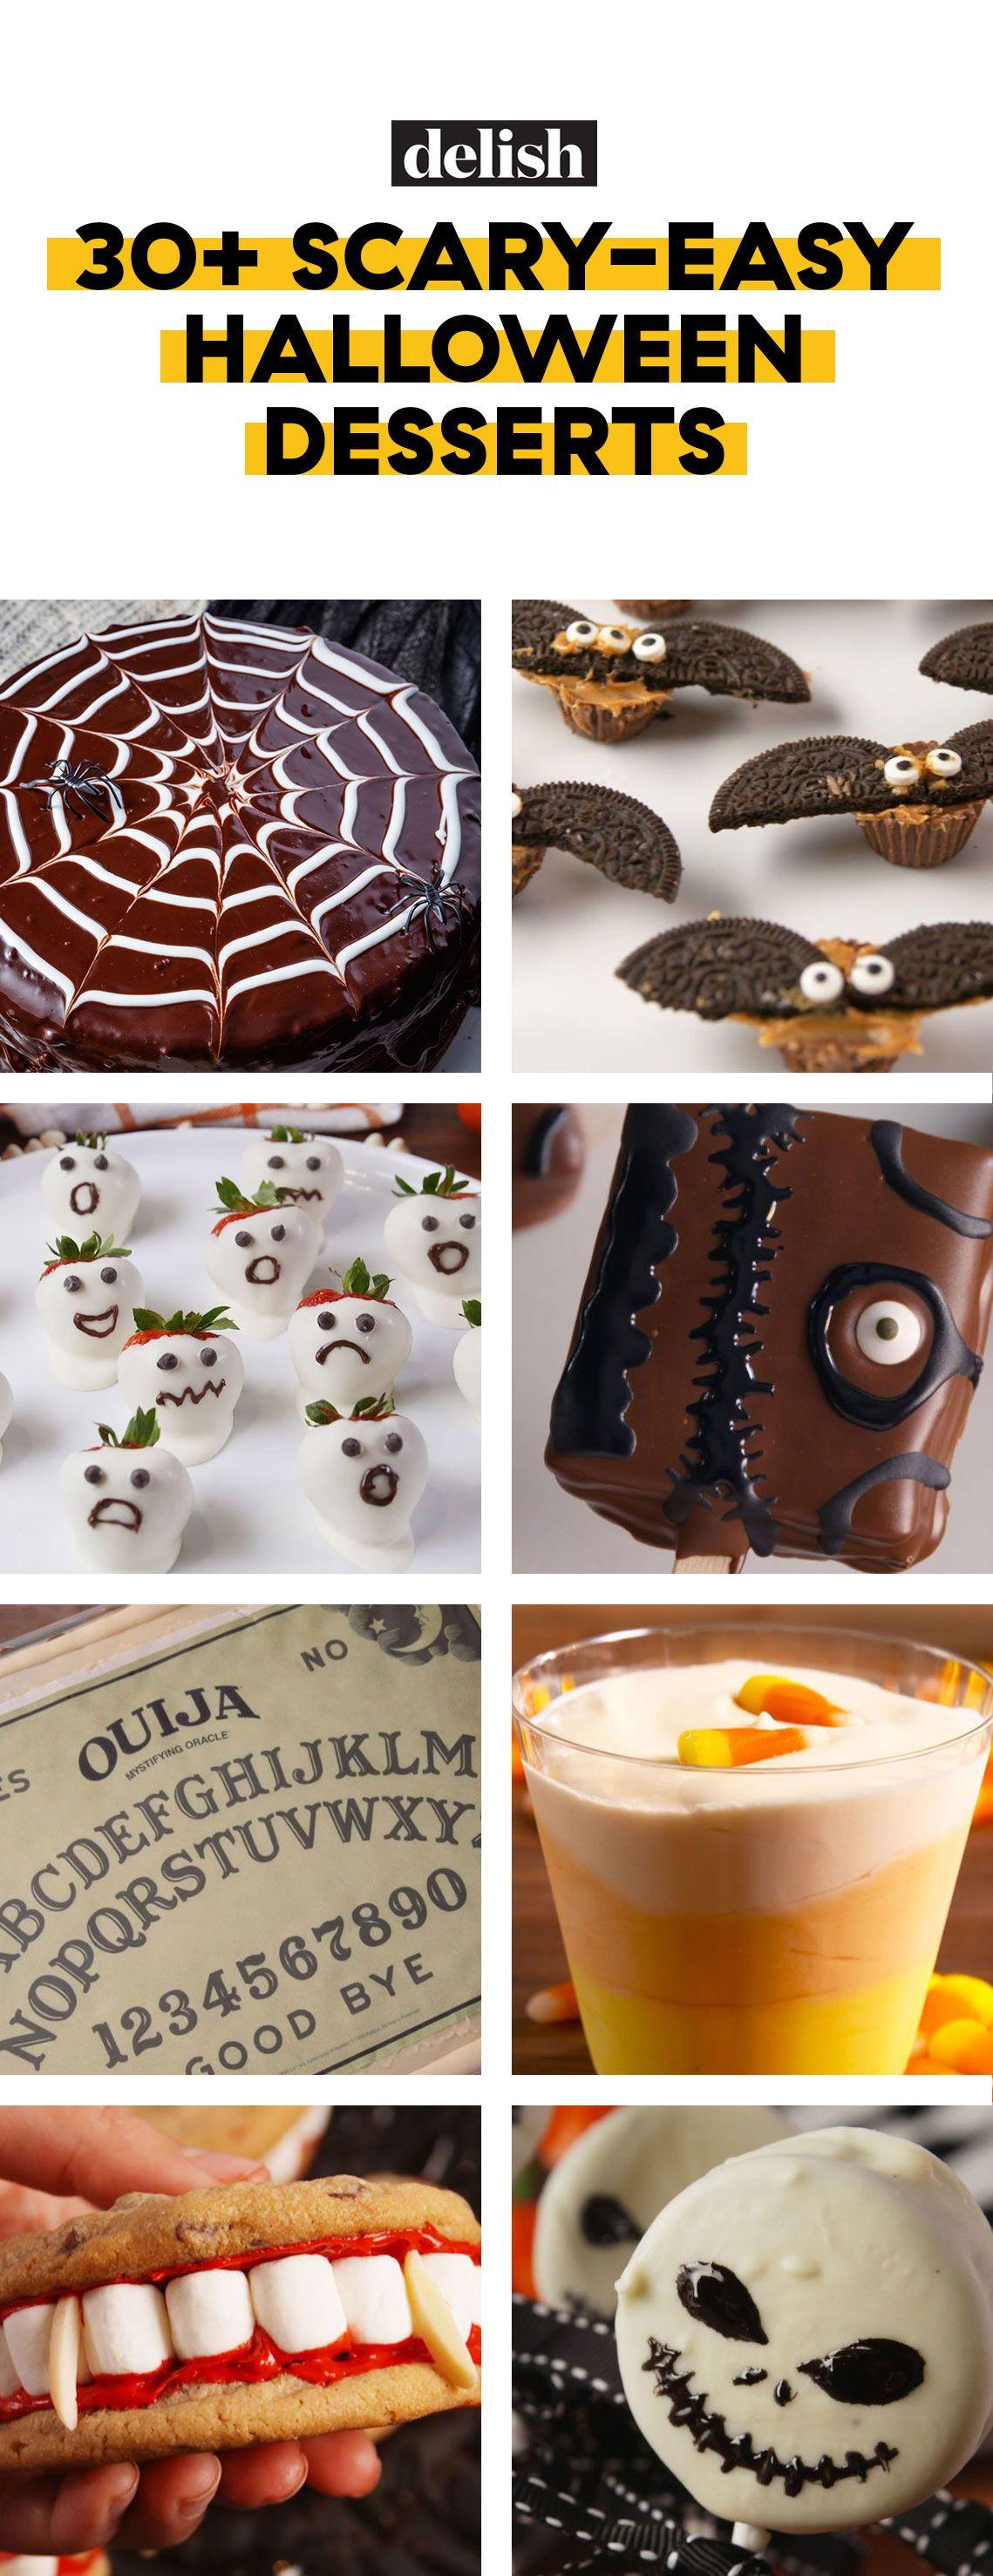 30 easy halloween desserts recipes for halloween party dessert ideas delishcom